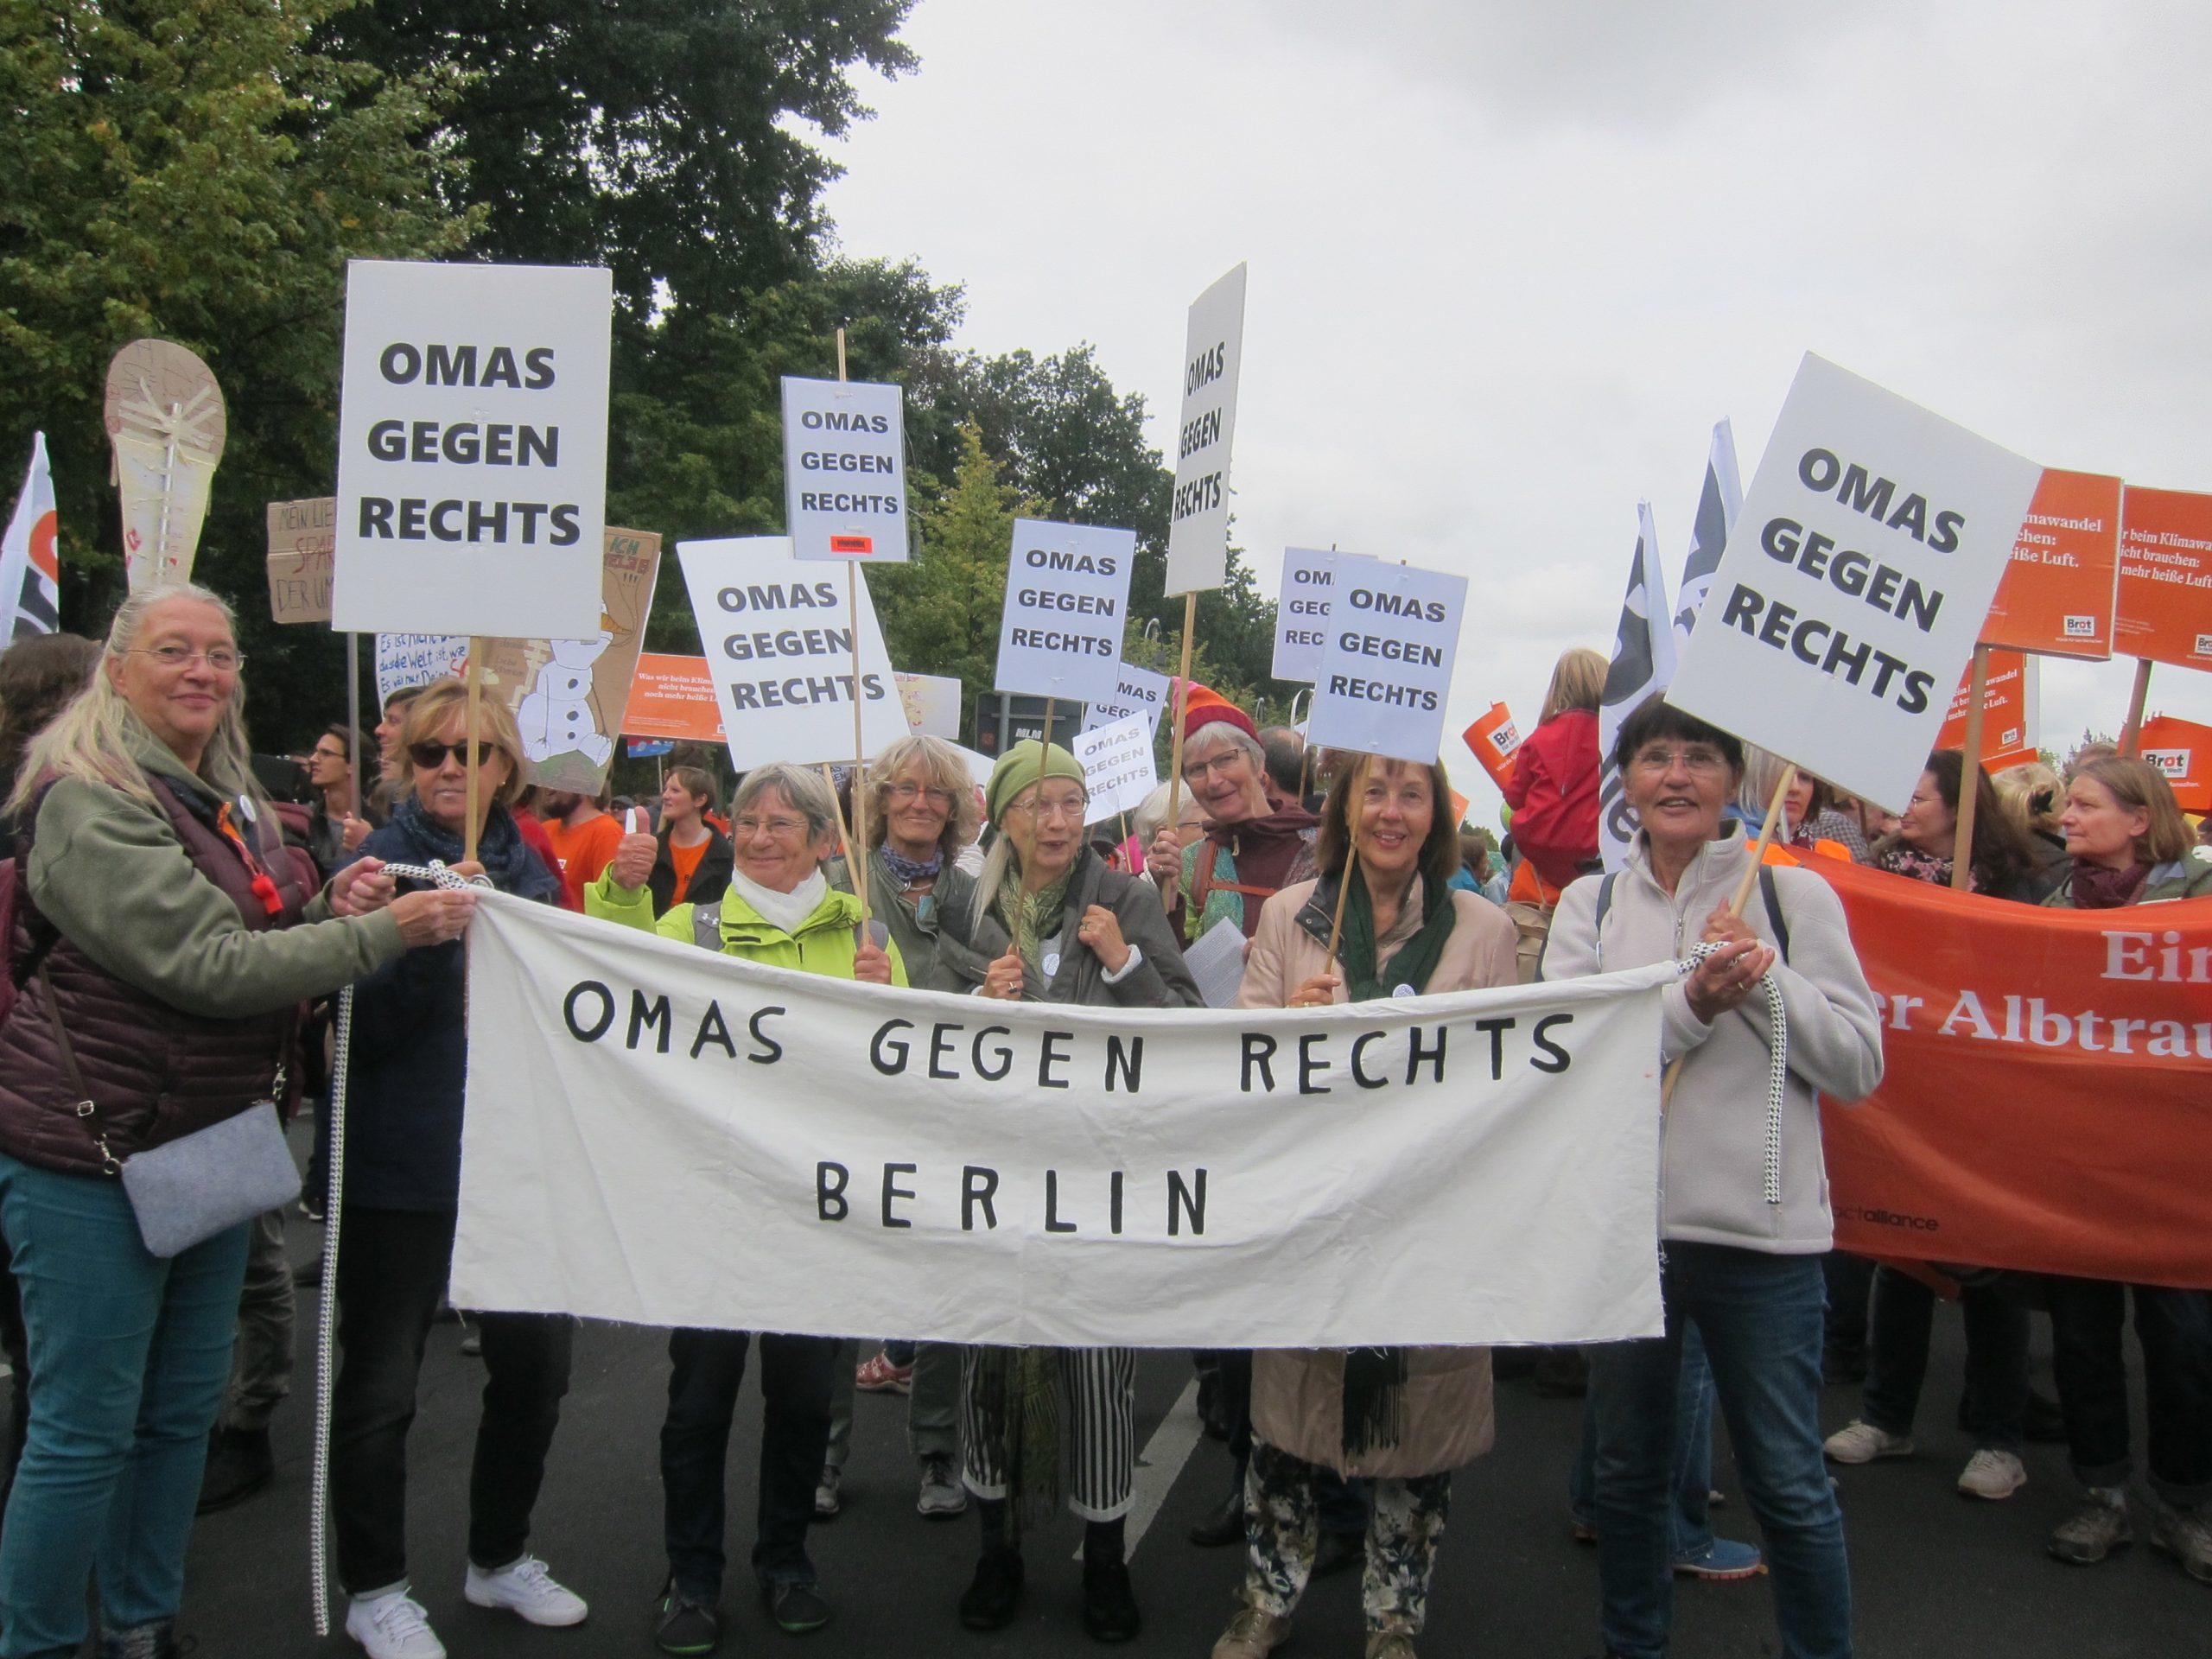 OMAs FfF mit Plakat Foto Gertrud Graf